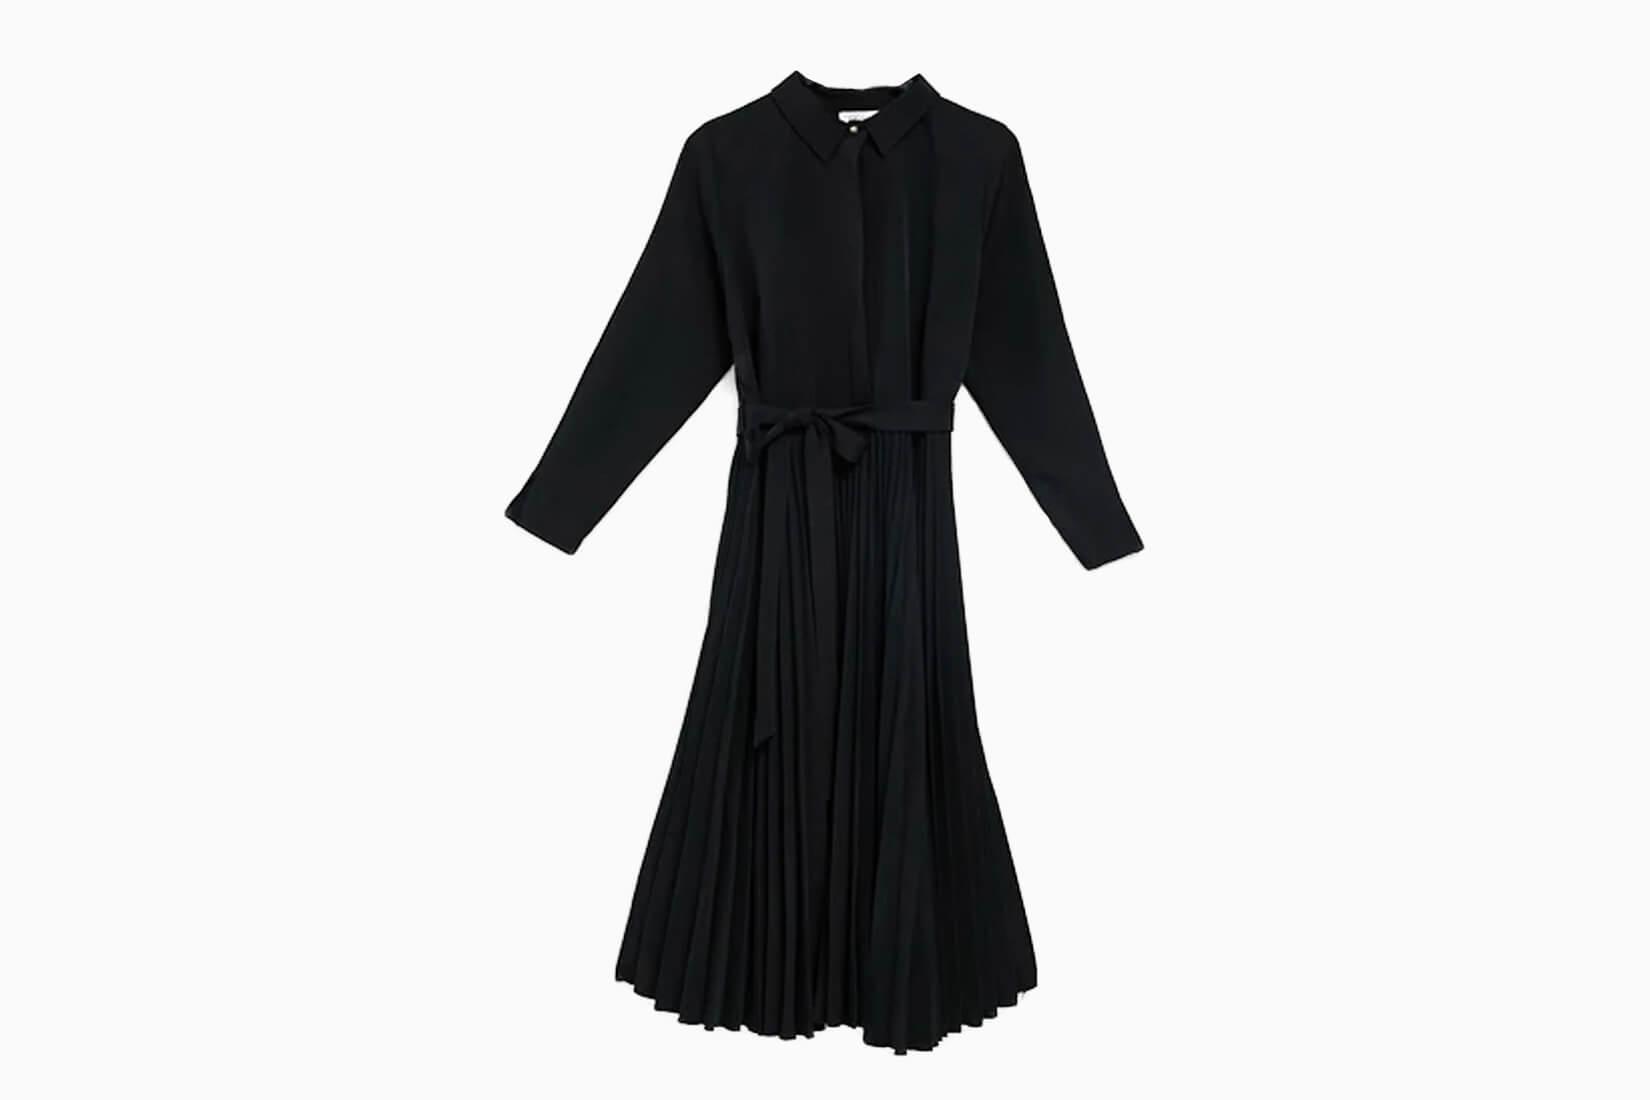 best little black dresses closet london - Luxe Digital